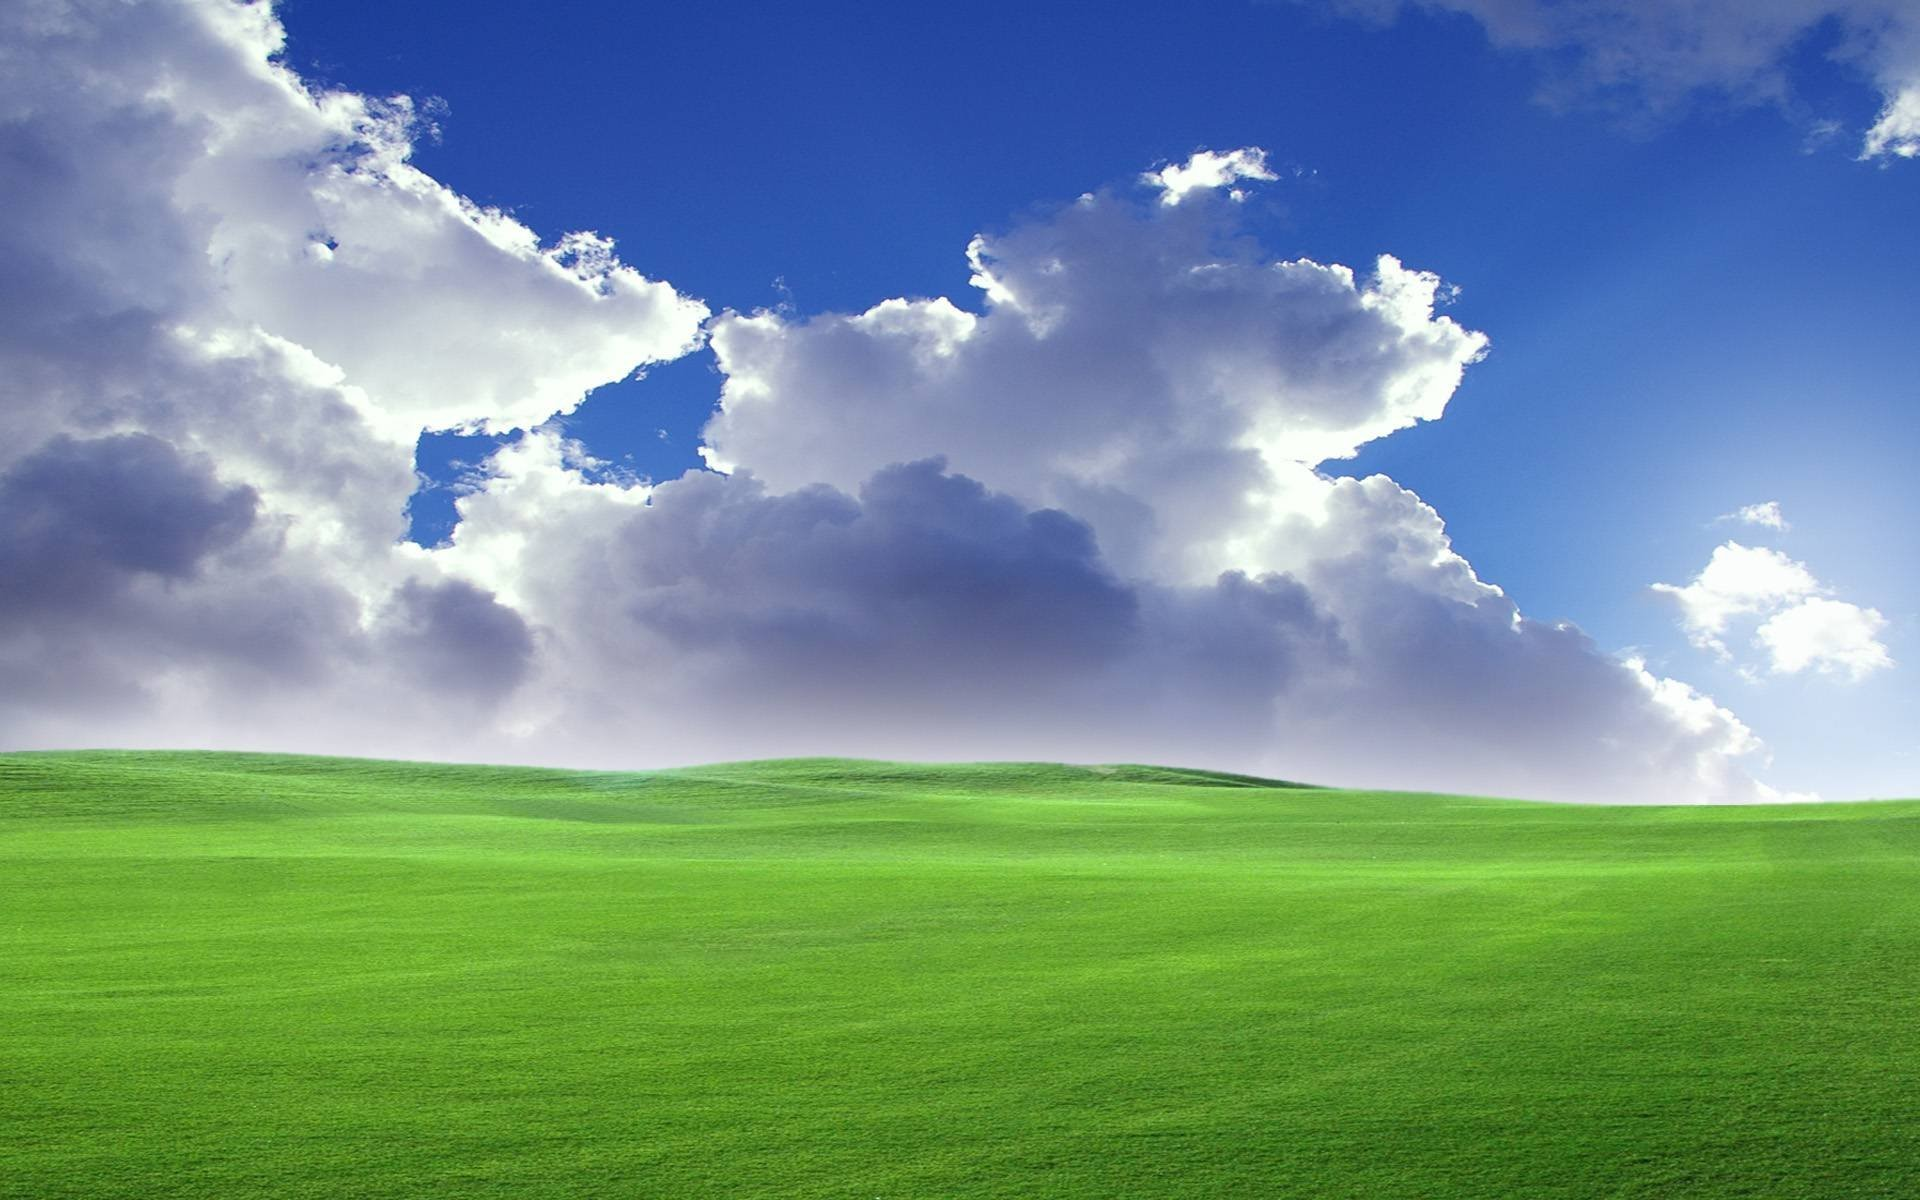 Windows Xp Background 407557